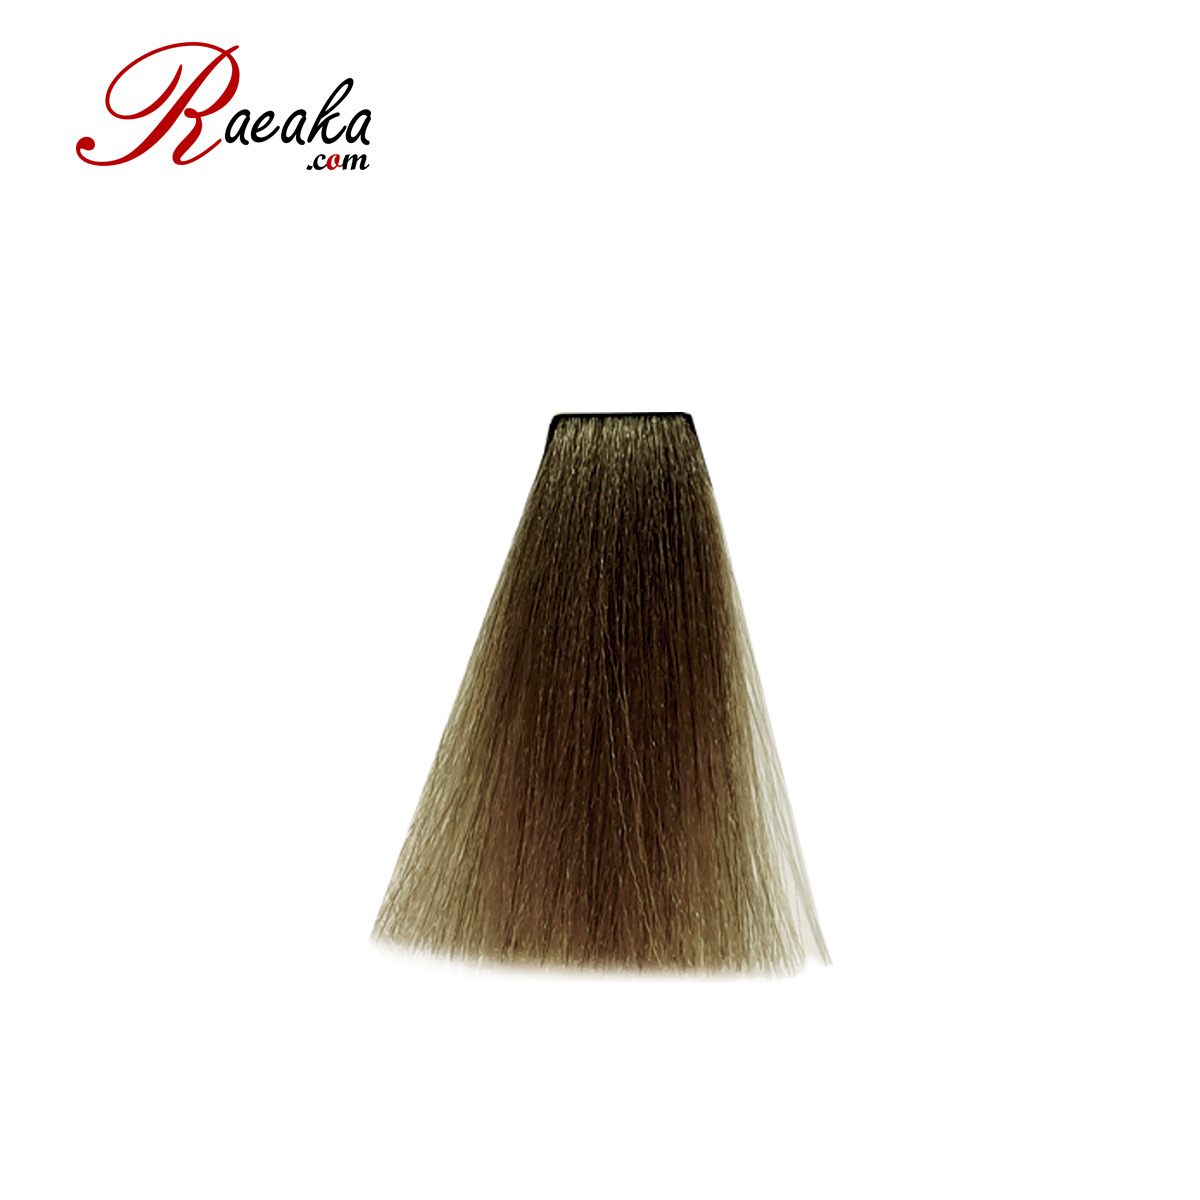 رنگ مو دوشس سری عسلی شماره 1-8 حجم 125 میلی لیتر